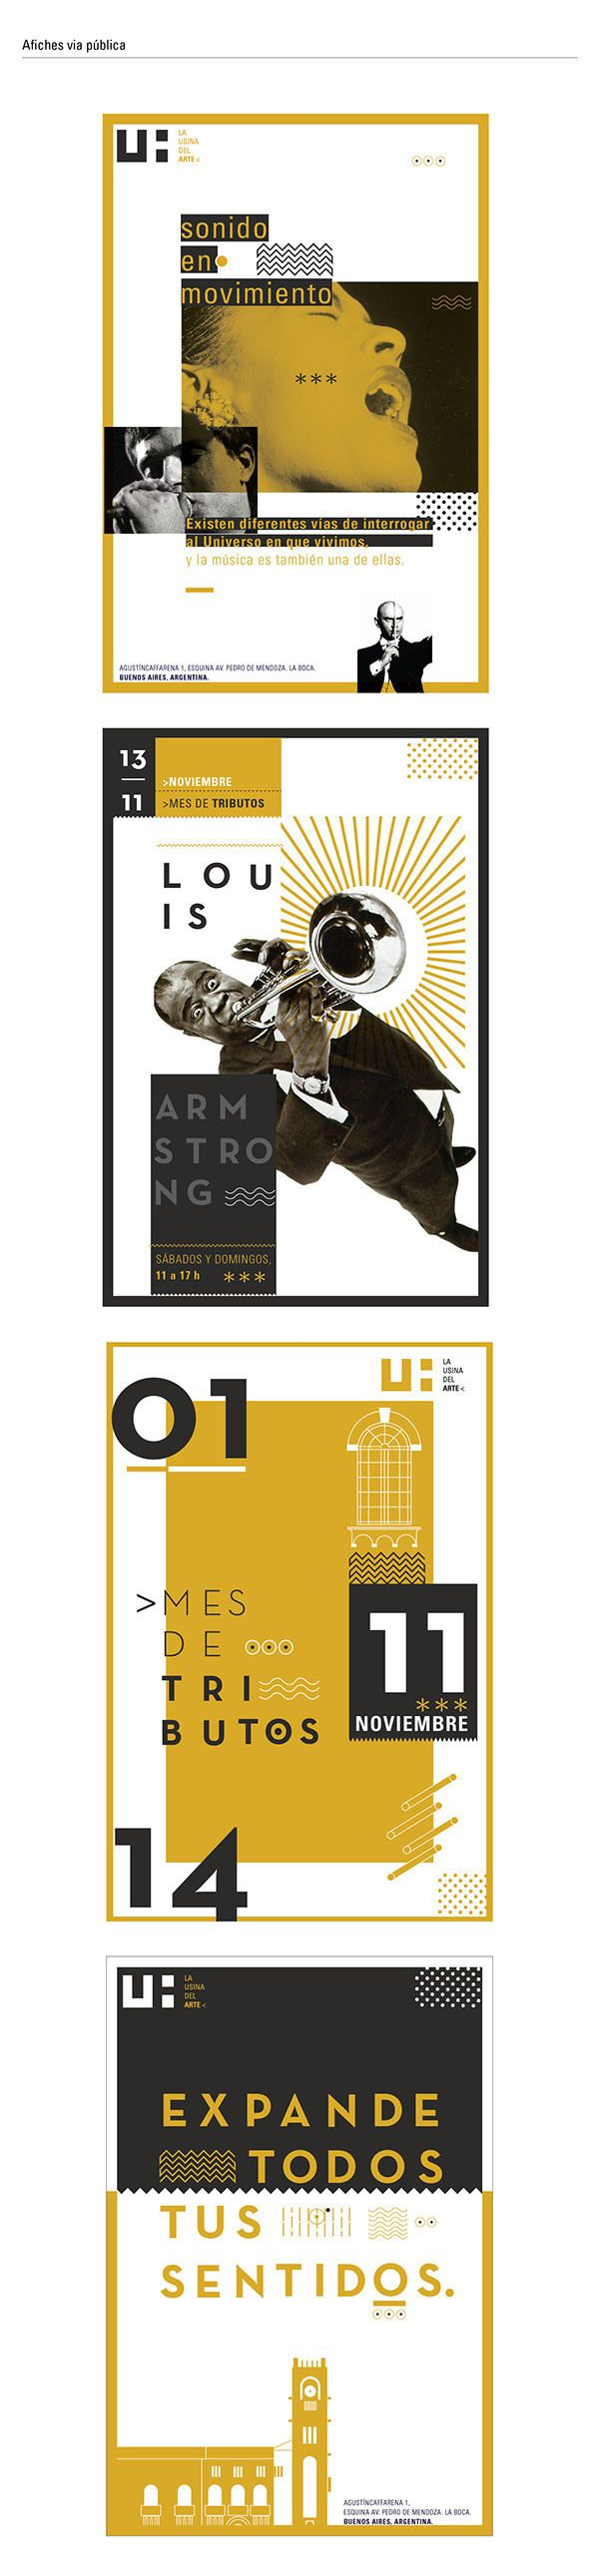 """Usina del Arte"" Istitutional Image, (2014), Poster public roads - ArtDesign, Graphic by Sebastián Dana (b. ,Argentina)"